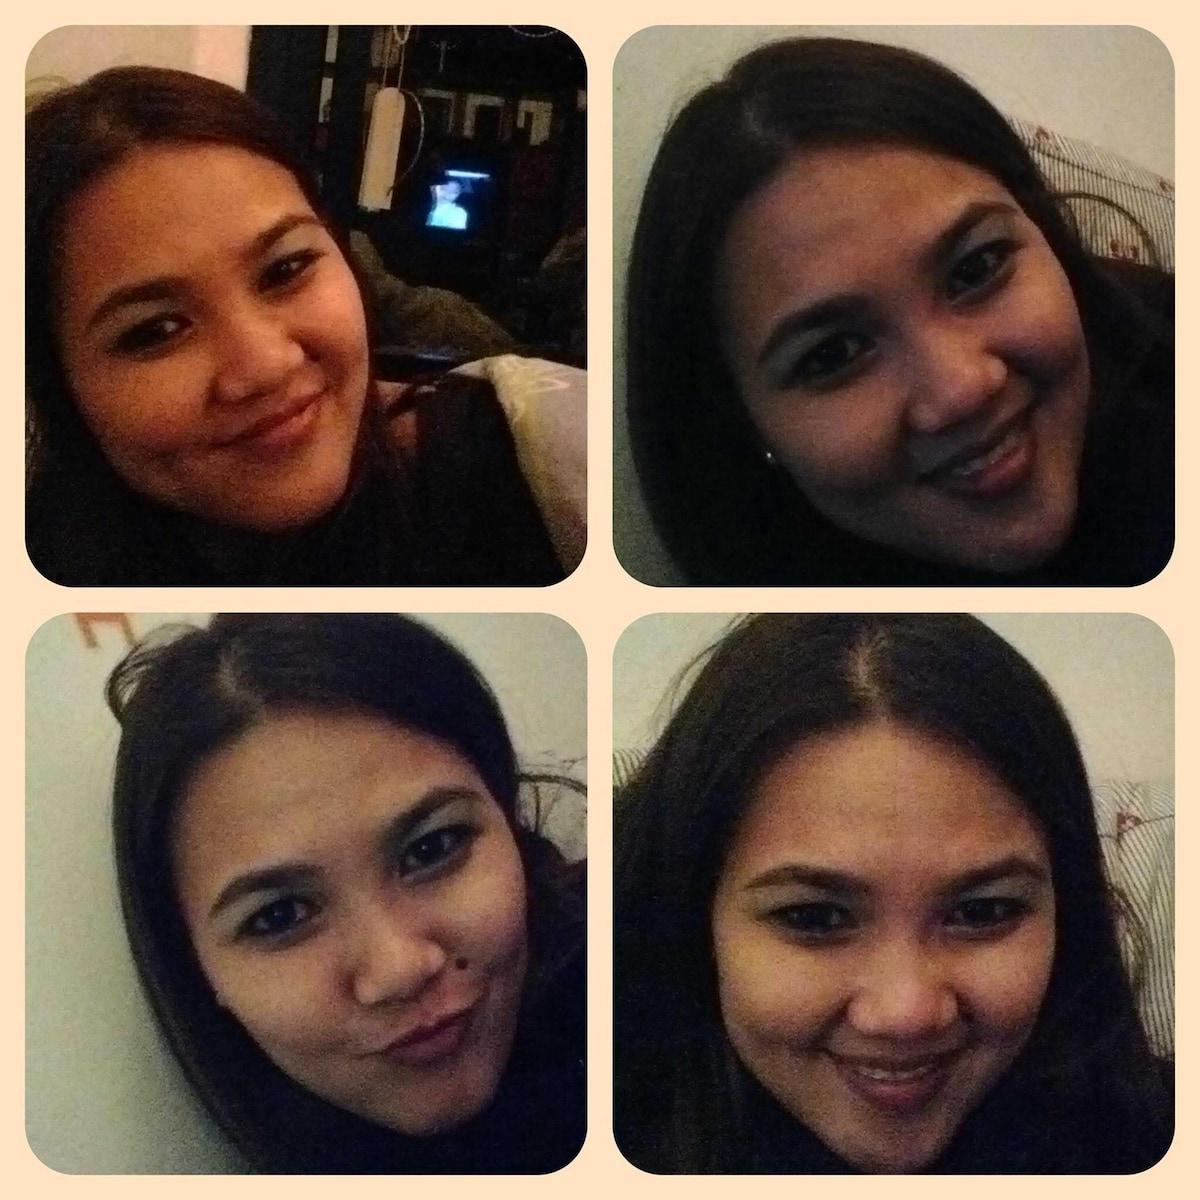 Jojie from davao city